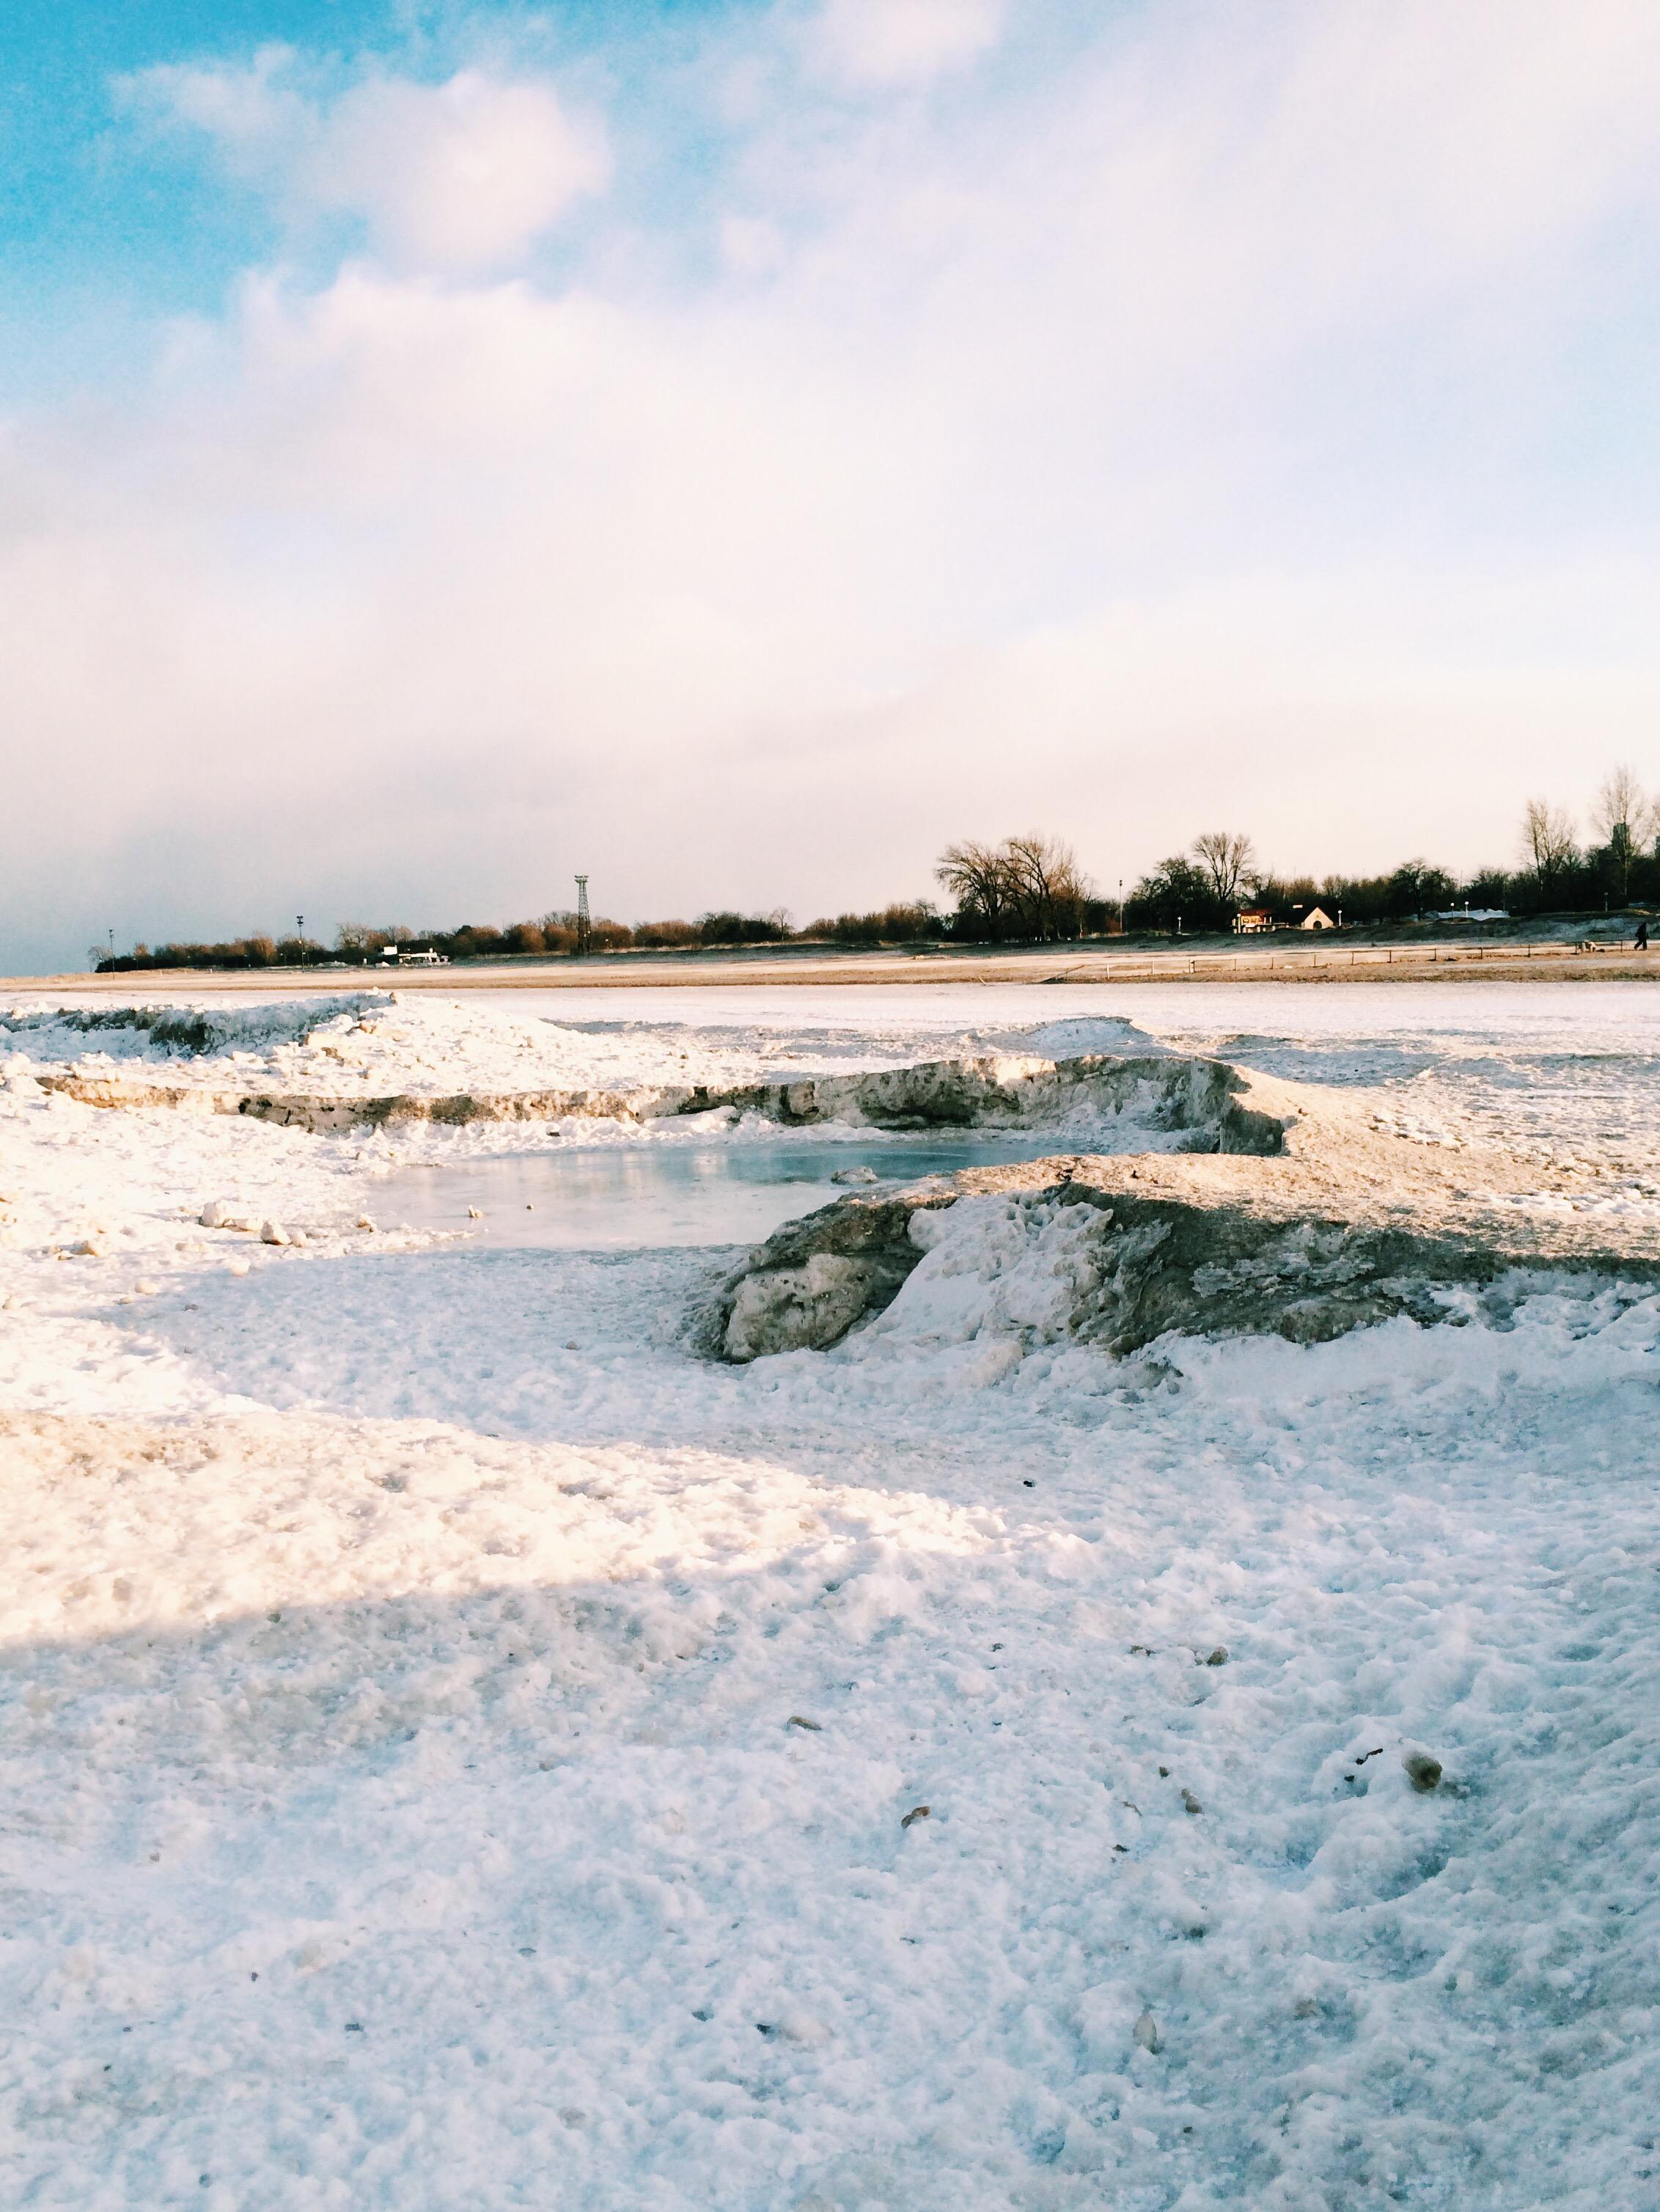 LakeMichigan_BrynaShields5